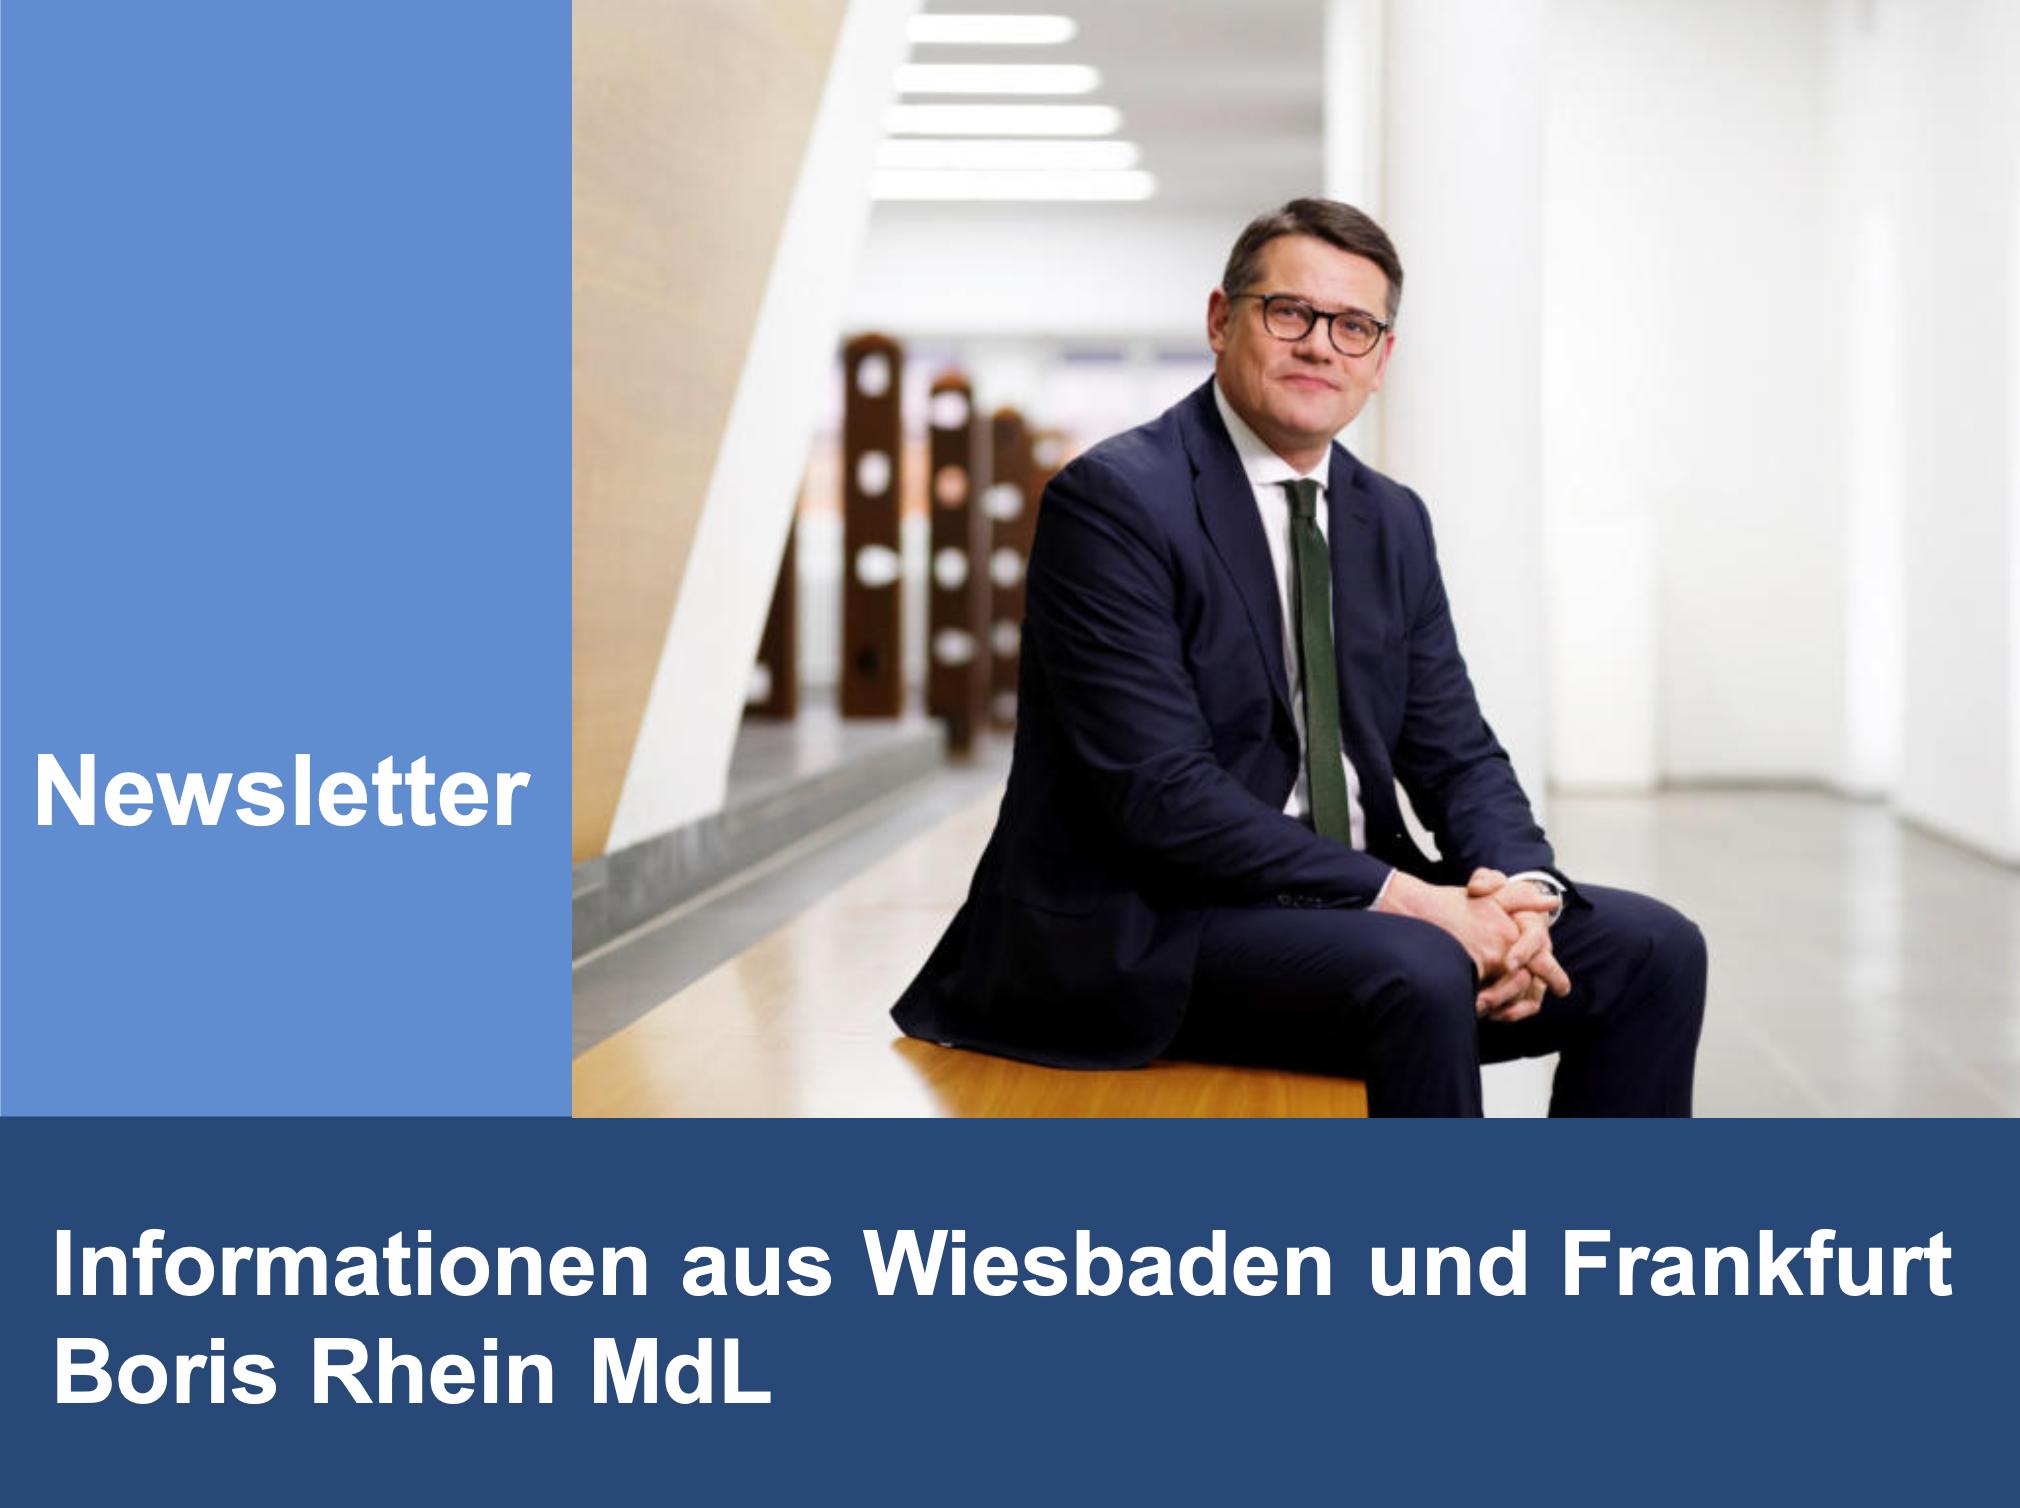 newsletter-boris-rhein-mdl